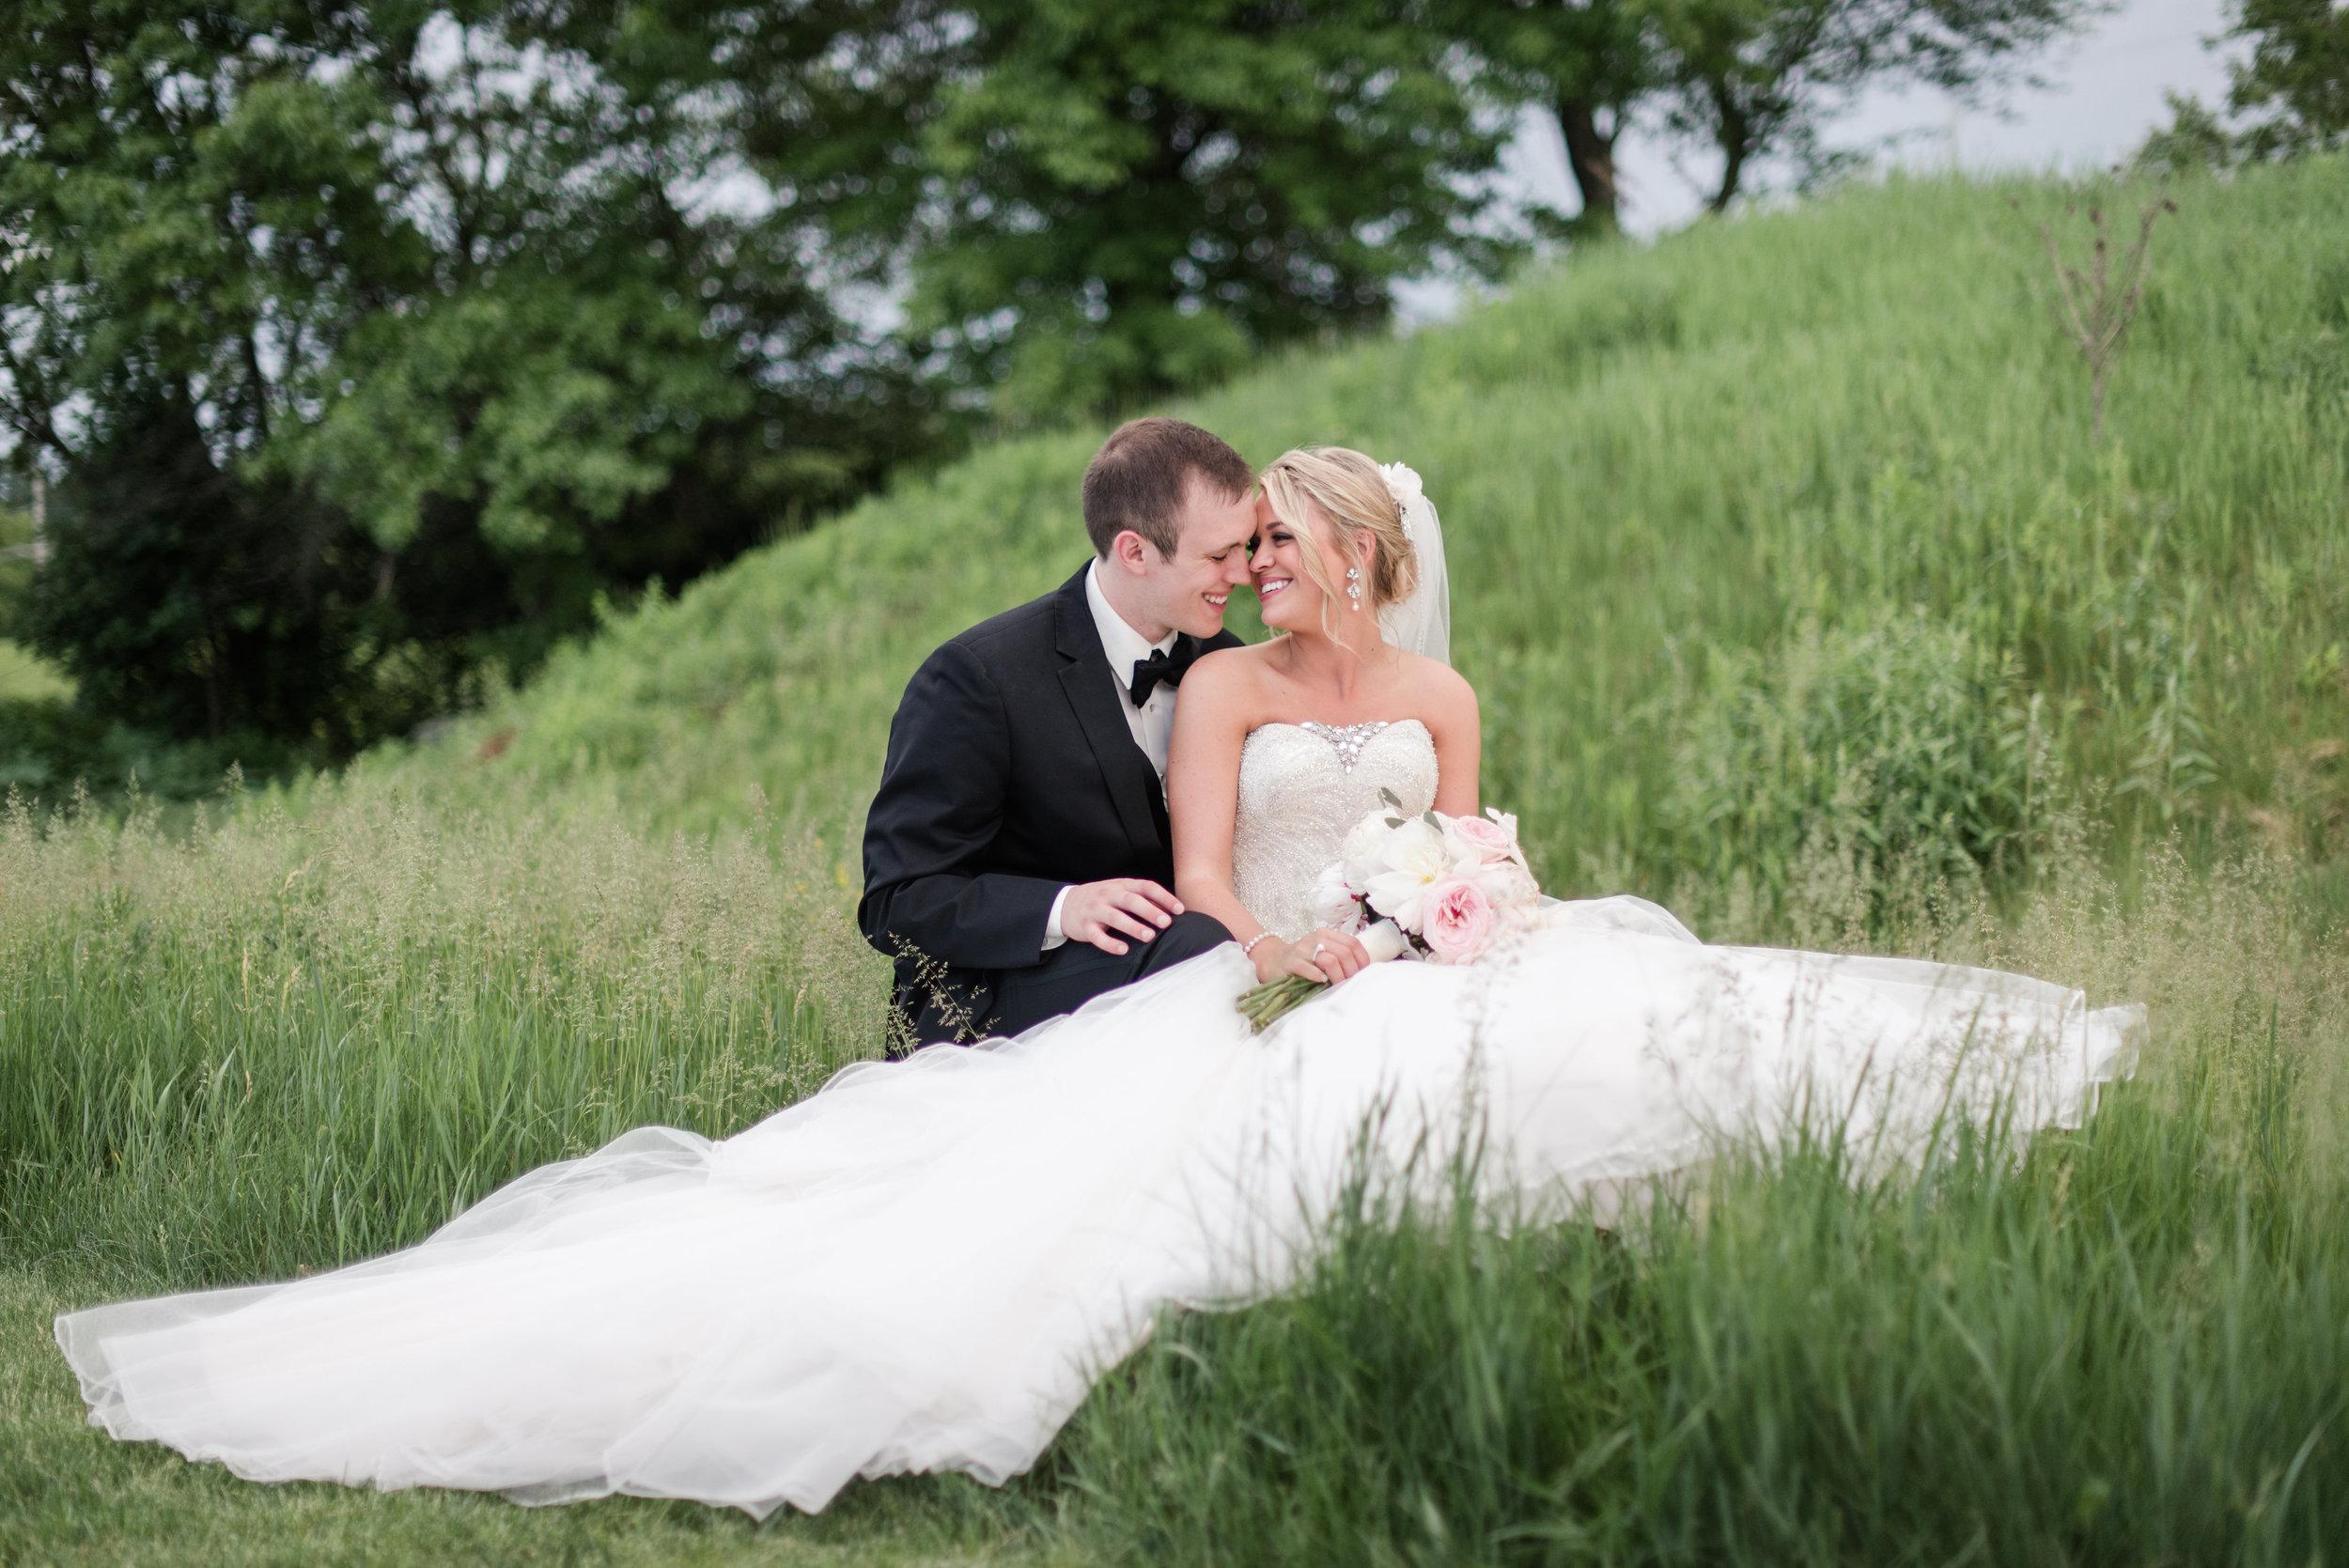 Chula Vista resort weddings - wisconsin dells wedding planner